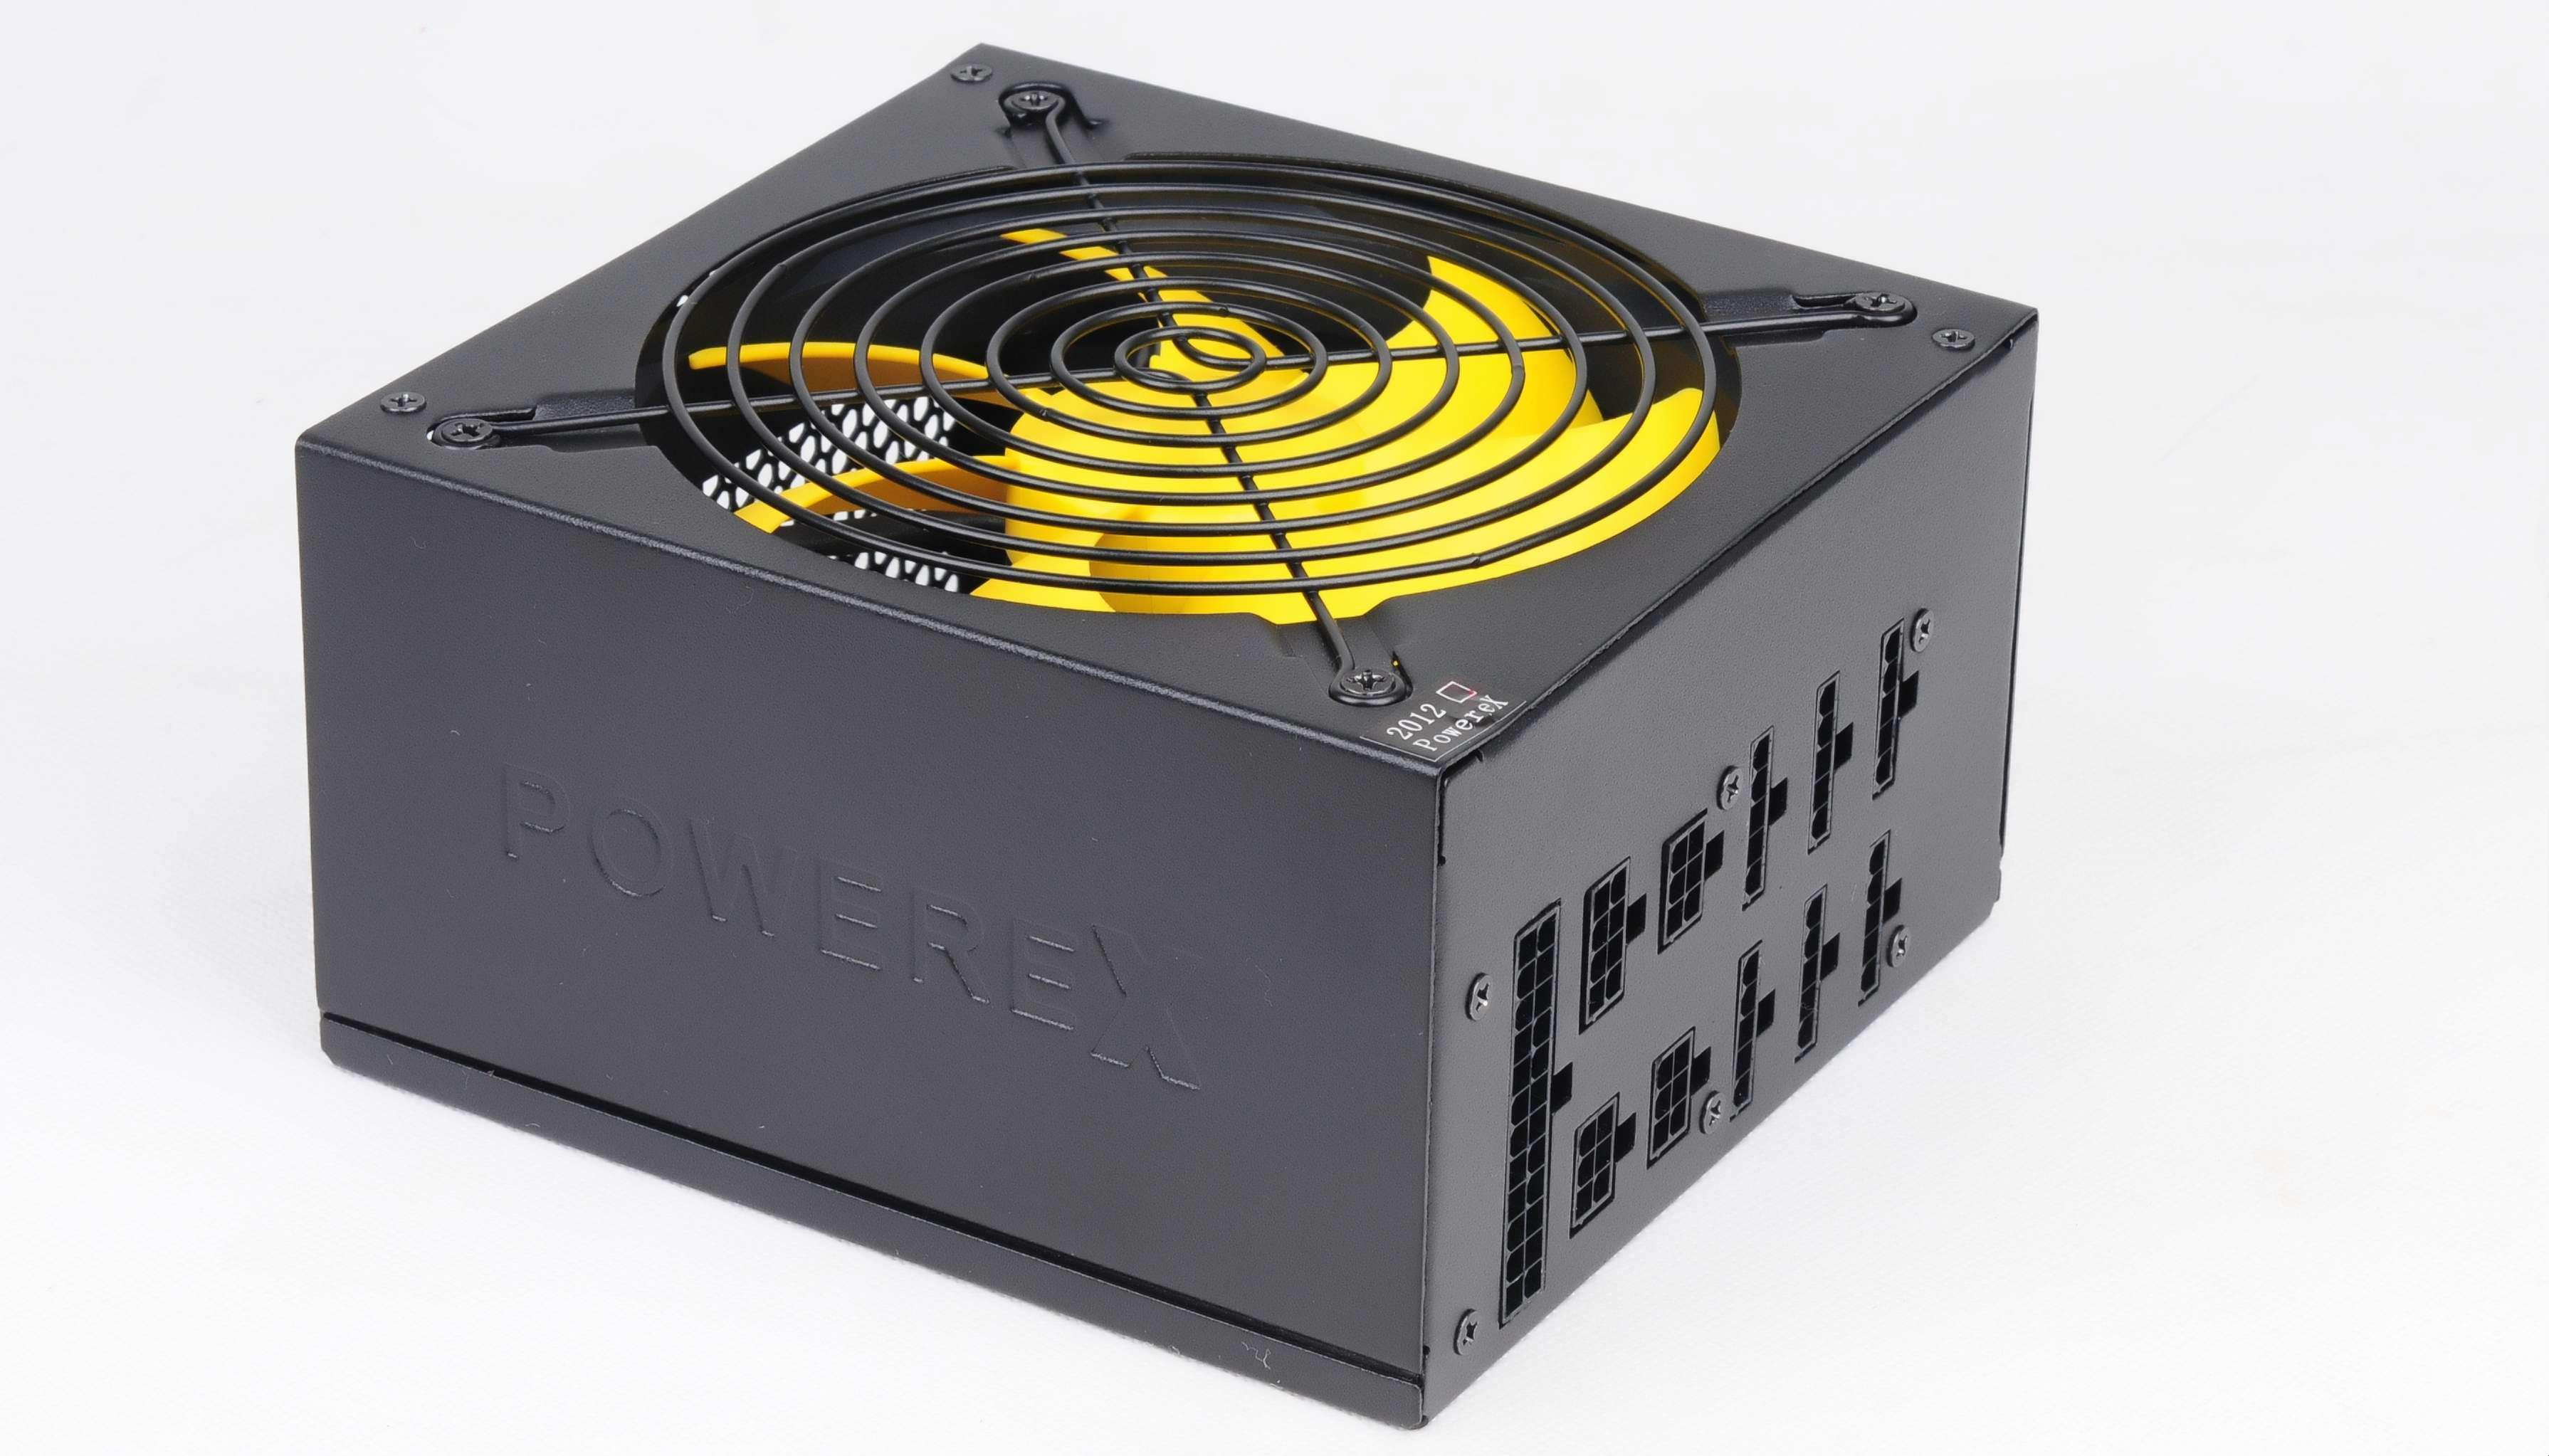 2013 Powerex machine computer power supply full module 500w power supply 80 bronze quieten line modular power supply